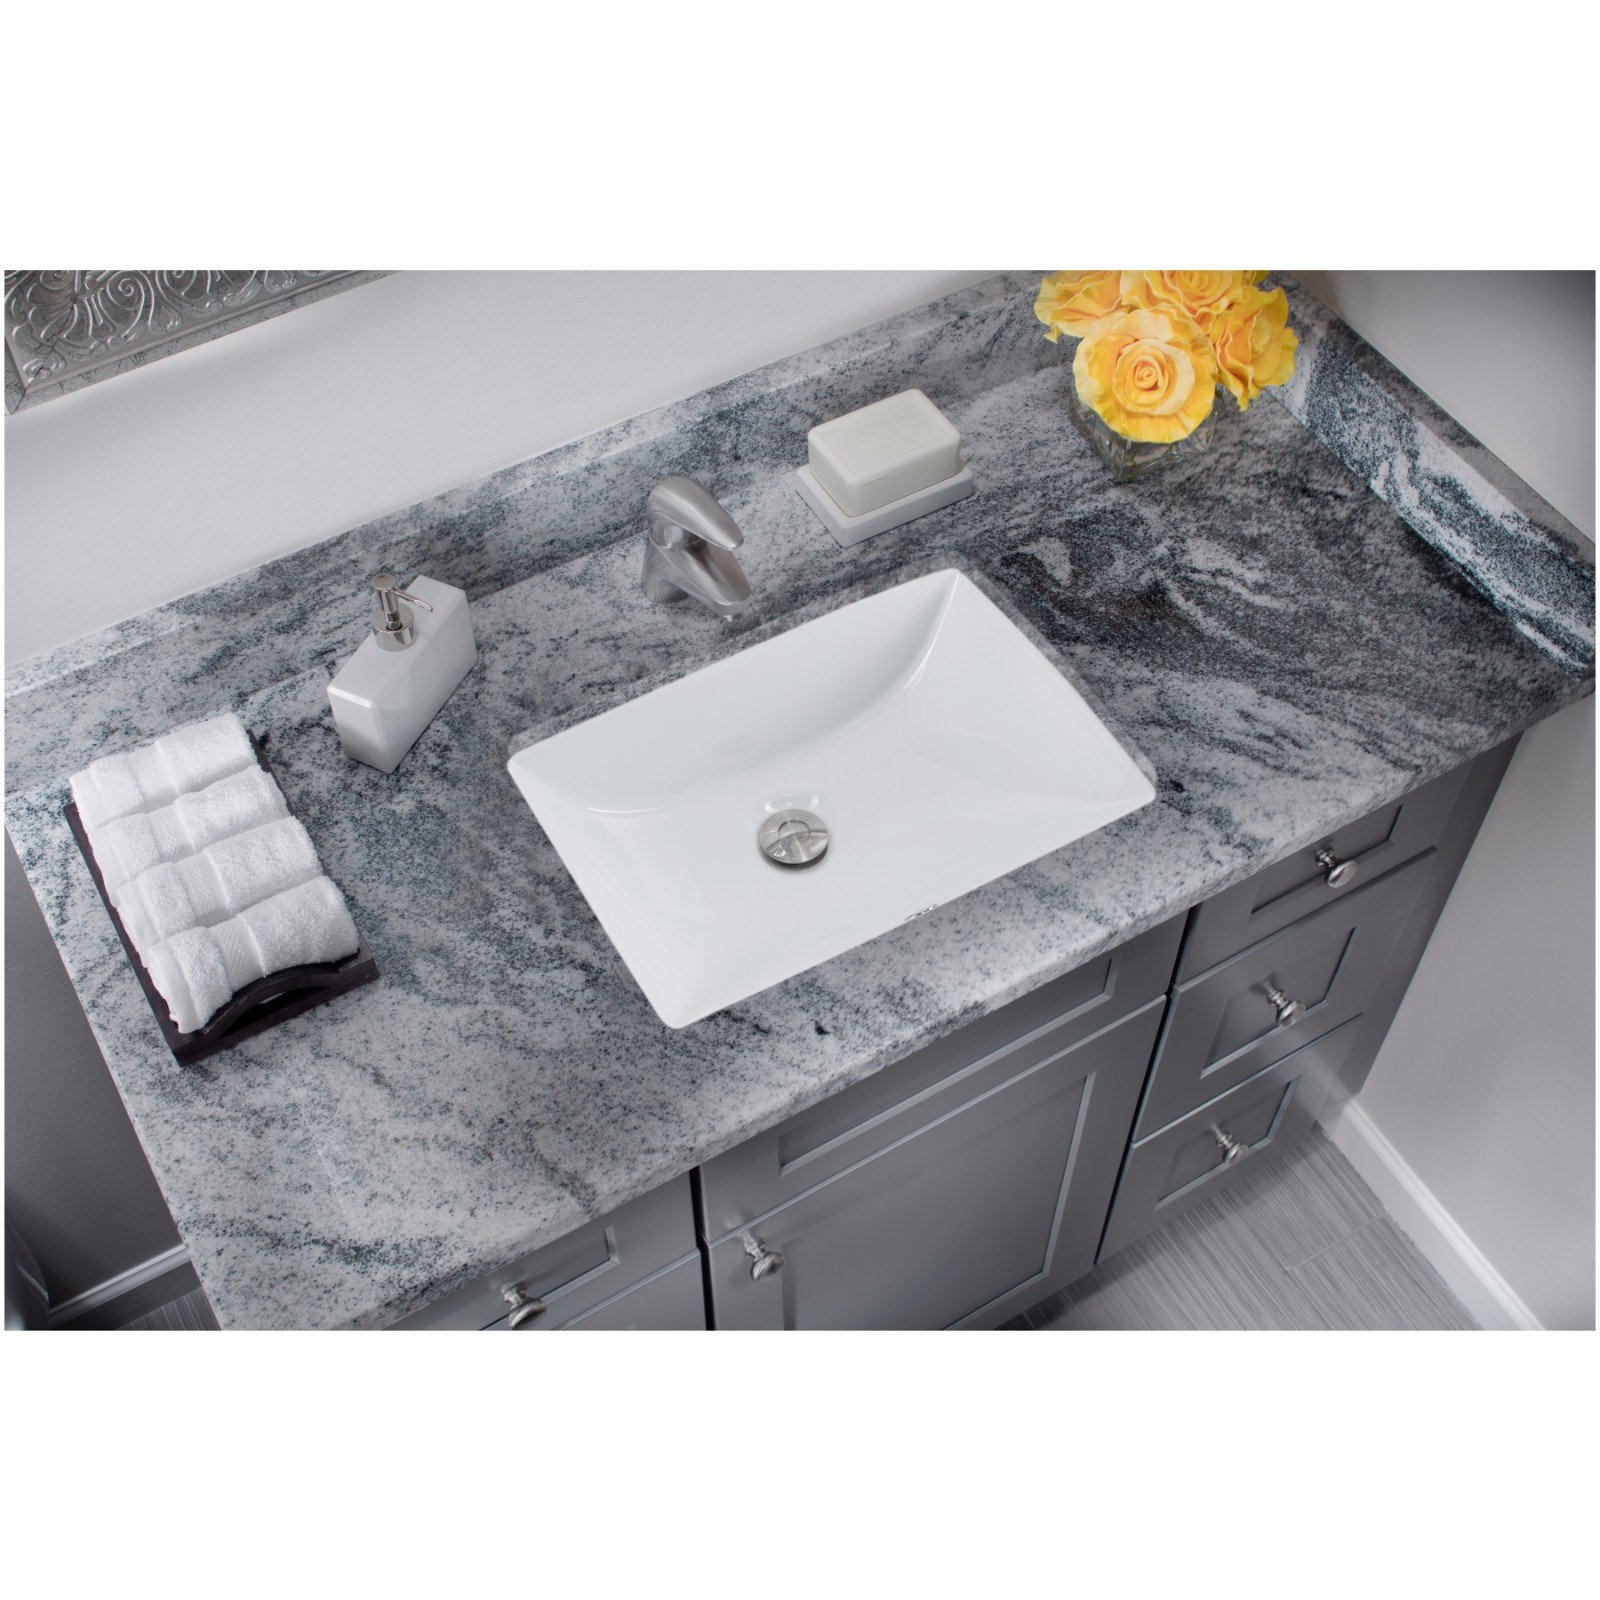 CAHABA CA425T1813-W 18 x 13 White Glazed Porcelain Bathroom Sink by CAHABA